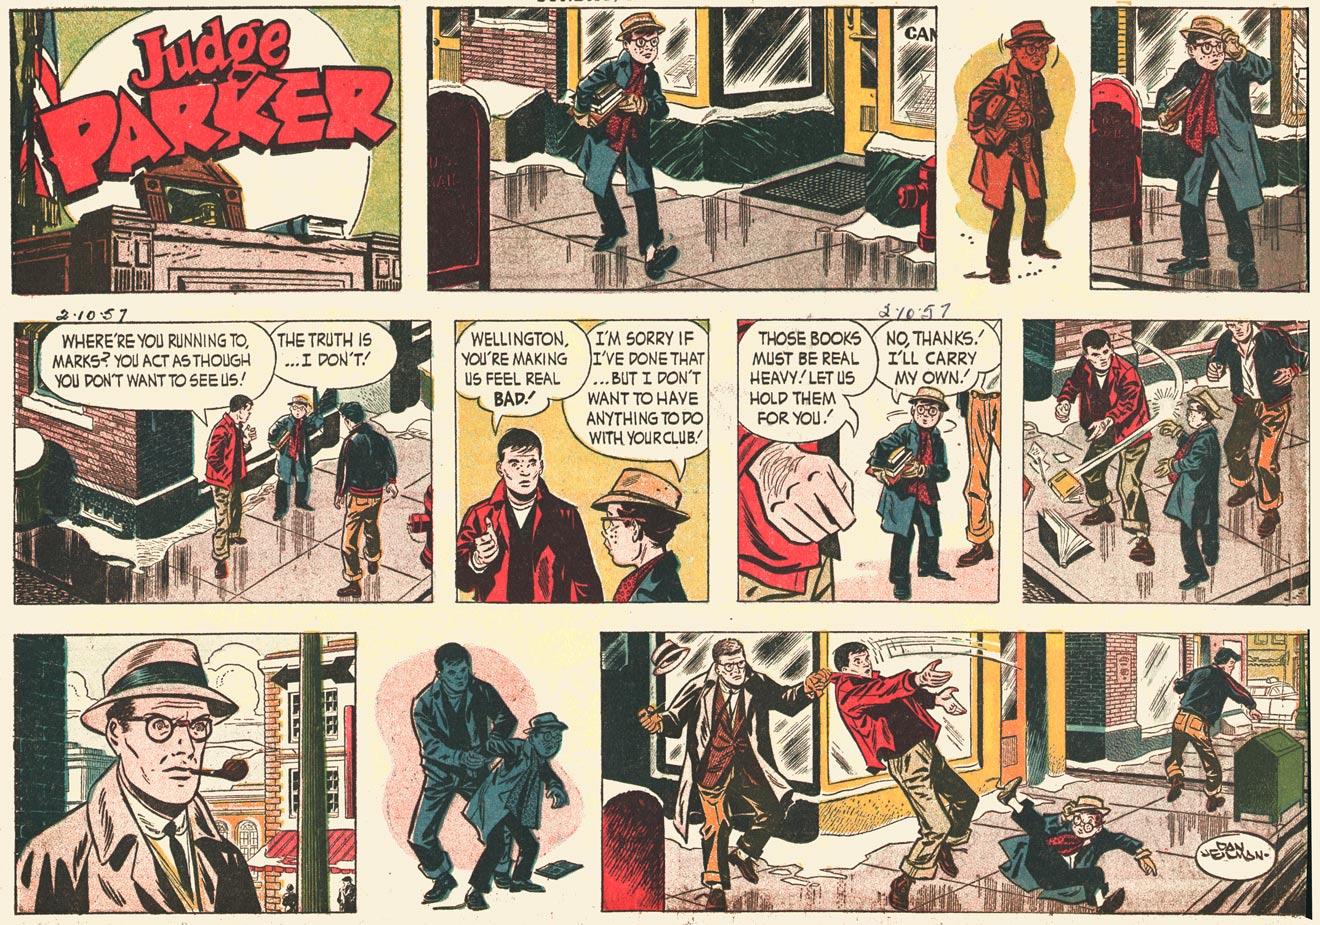 Judge-Parker-1957-02-10